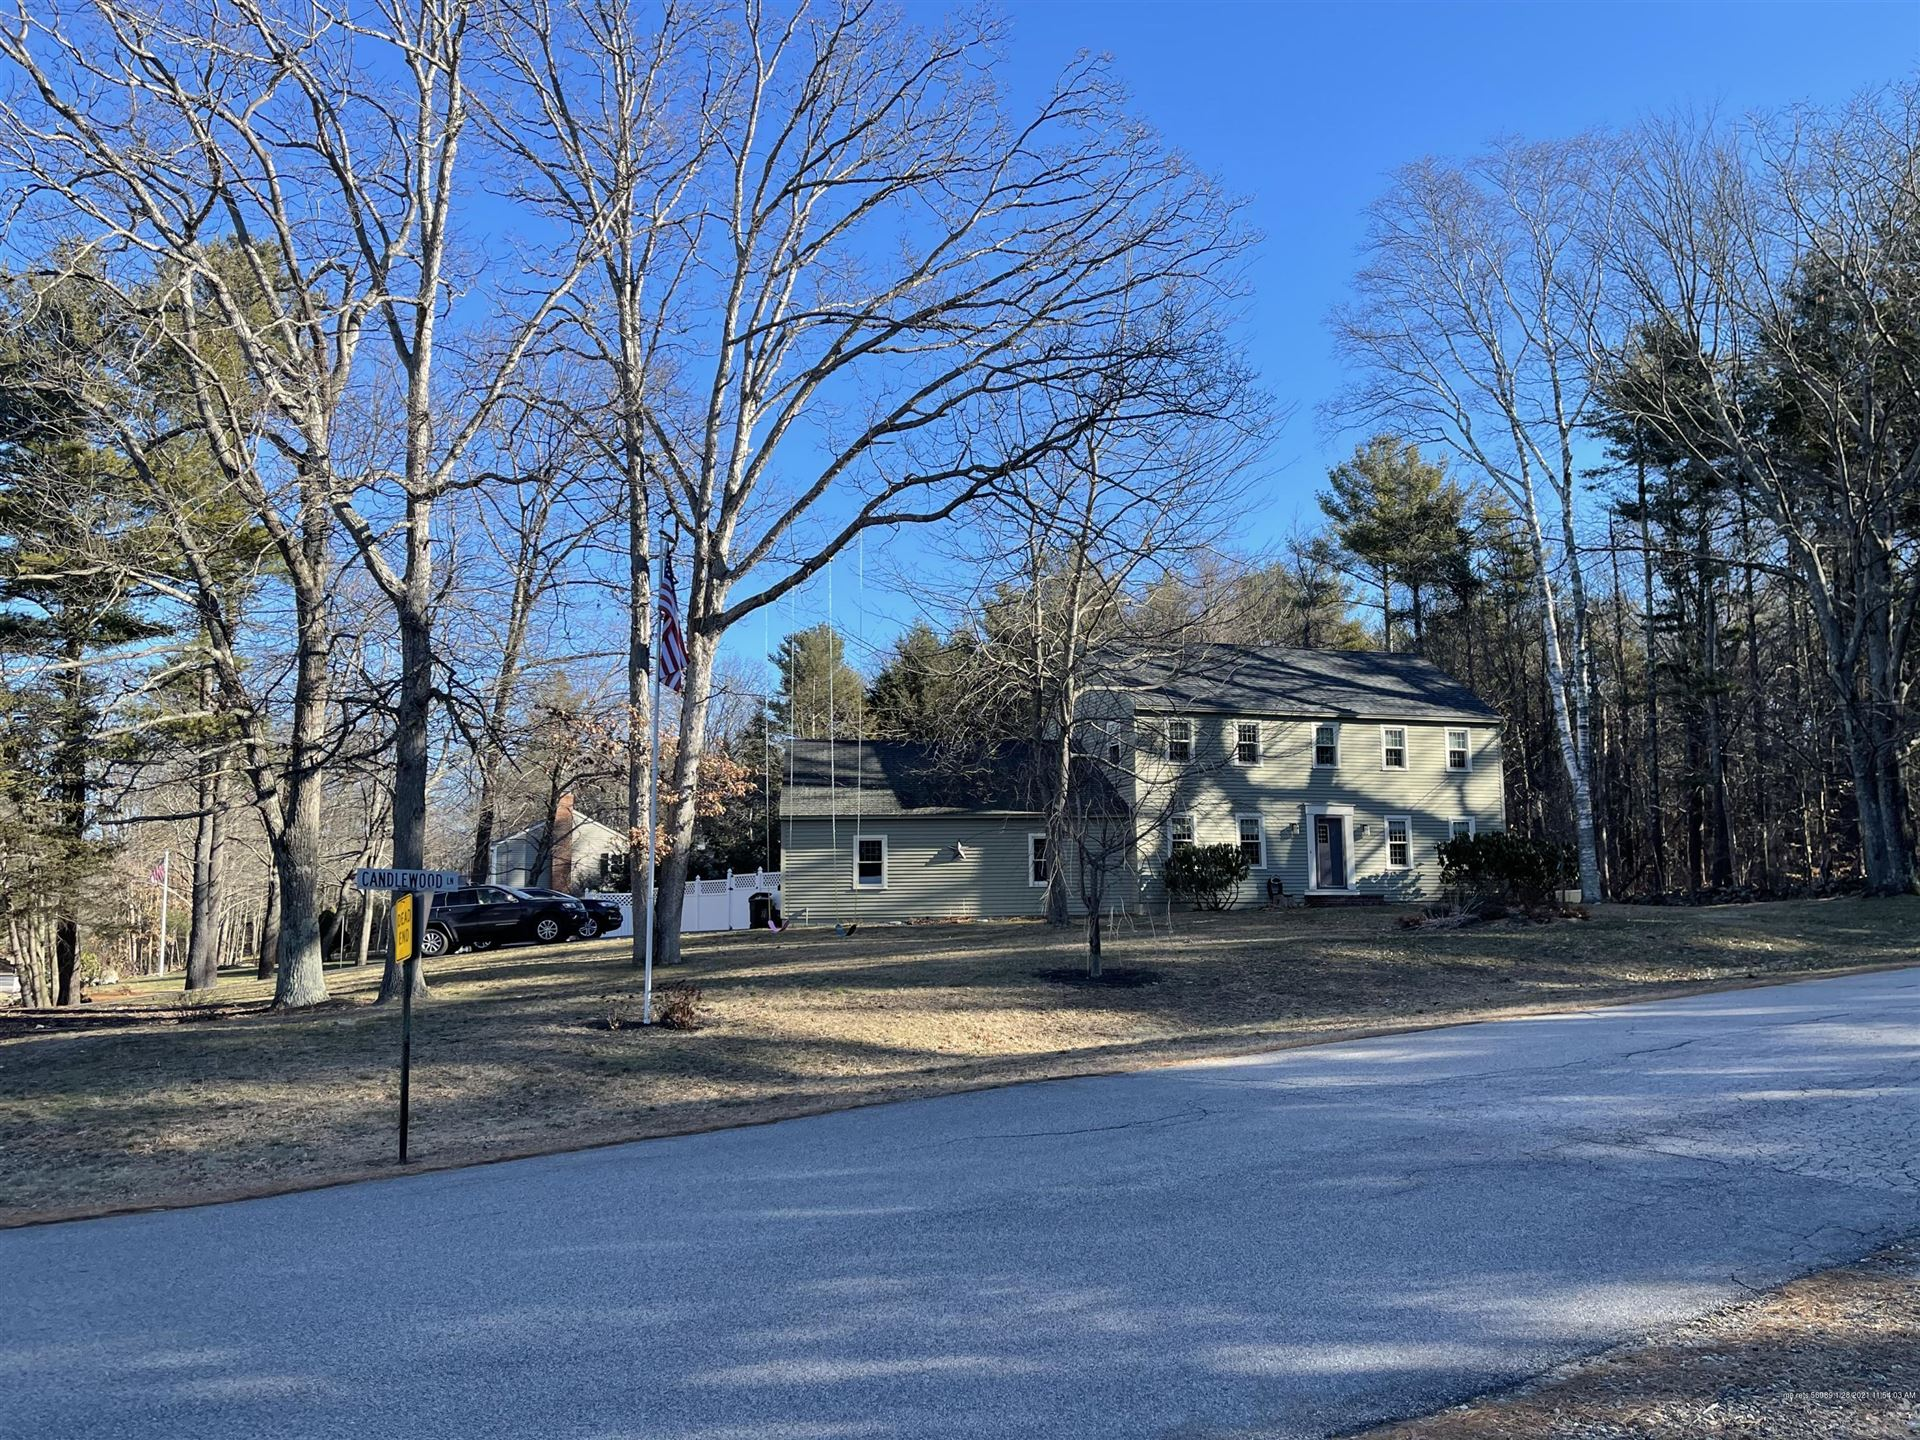 Photo of 101 Fieldstone Est Road, York, ME 03909 (MLS # 1480562)